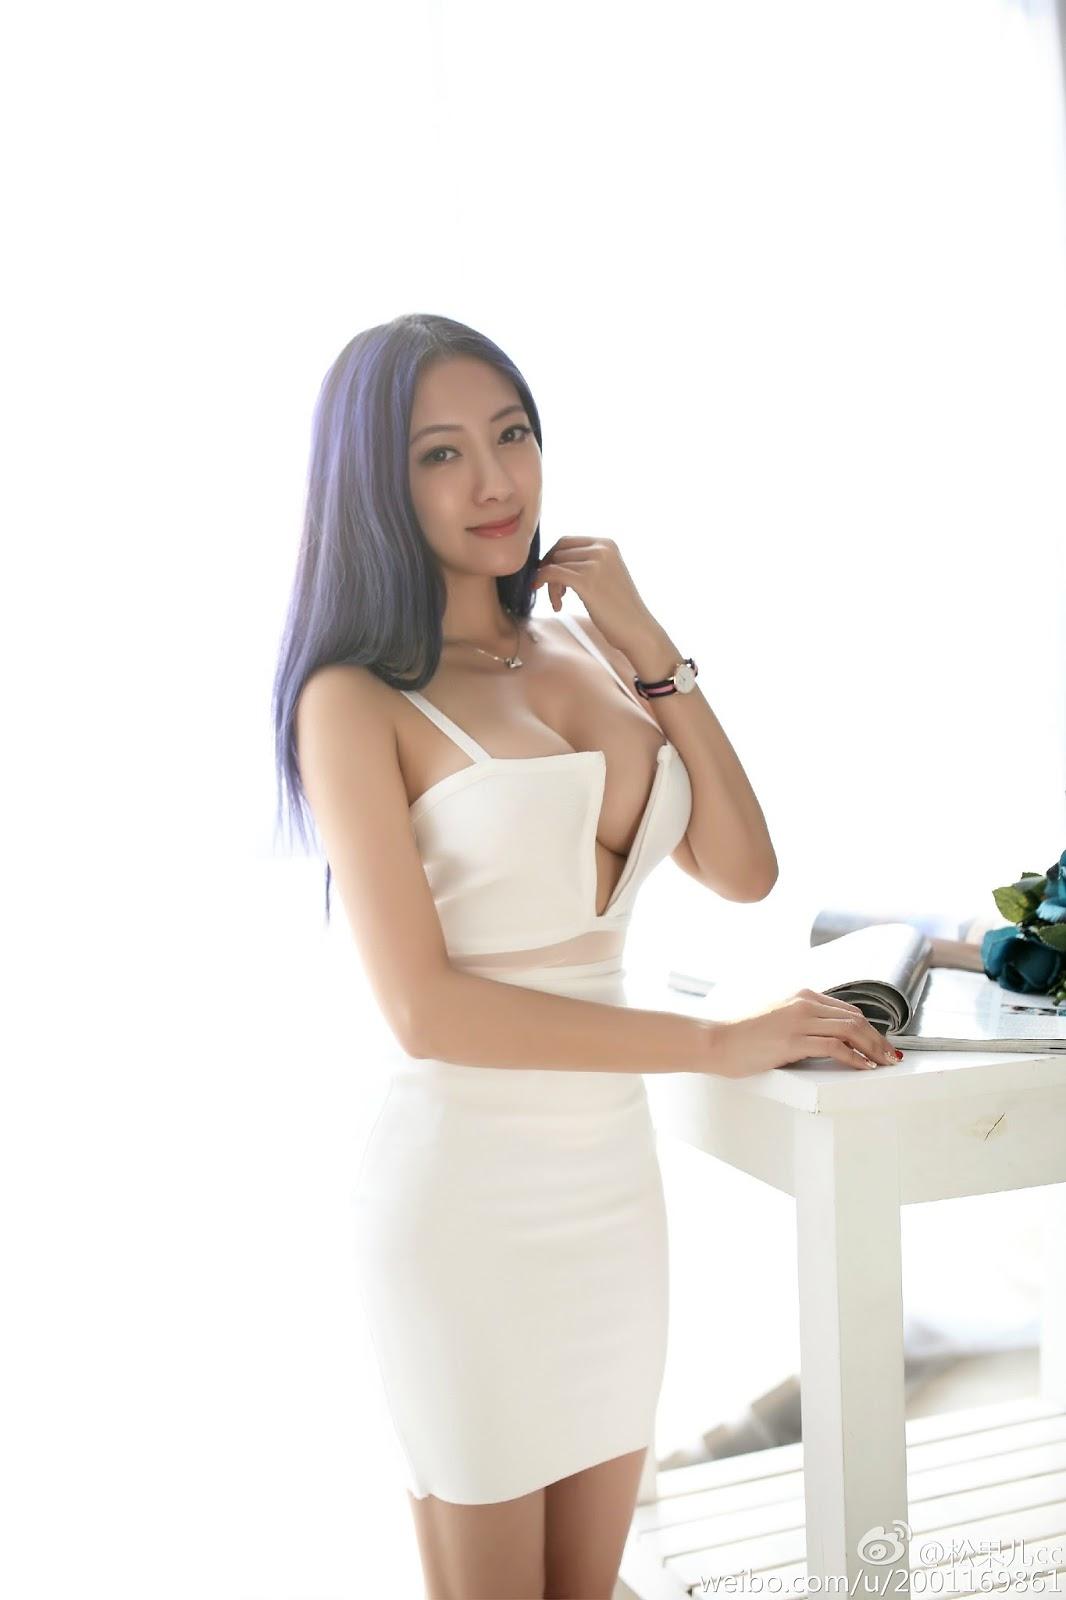 Asian Sexiest Bodies Model Song Guo Er 宋國洱 Massive Boobs Sensation